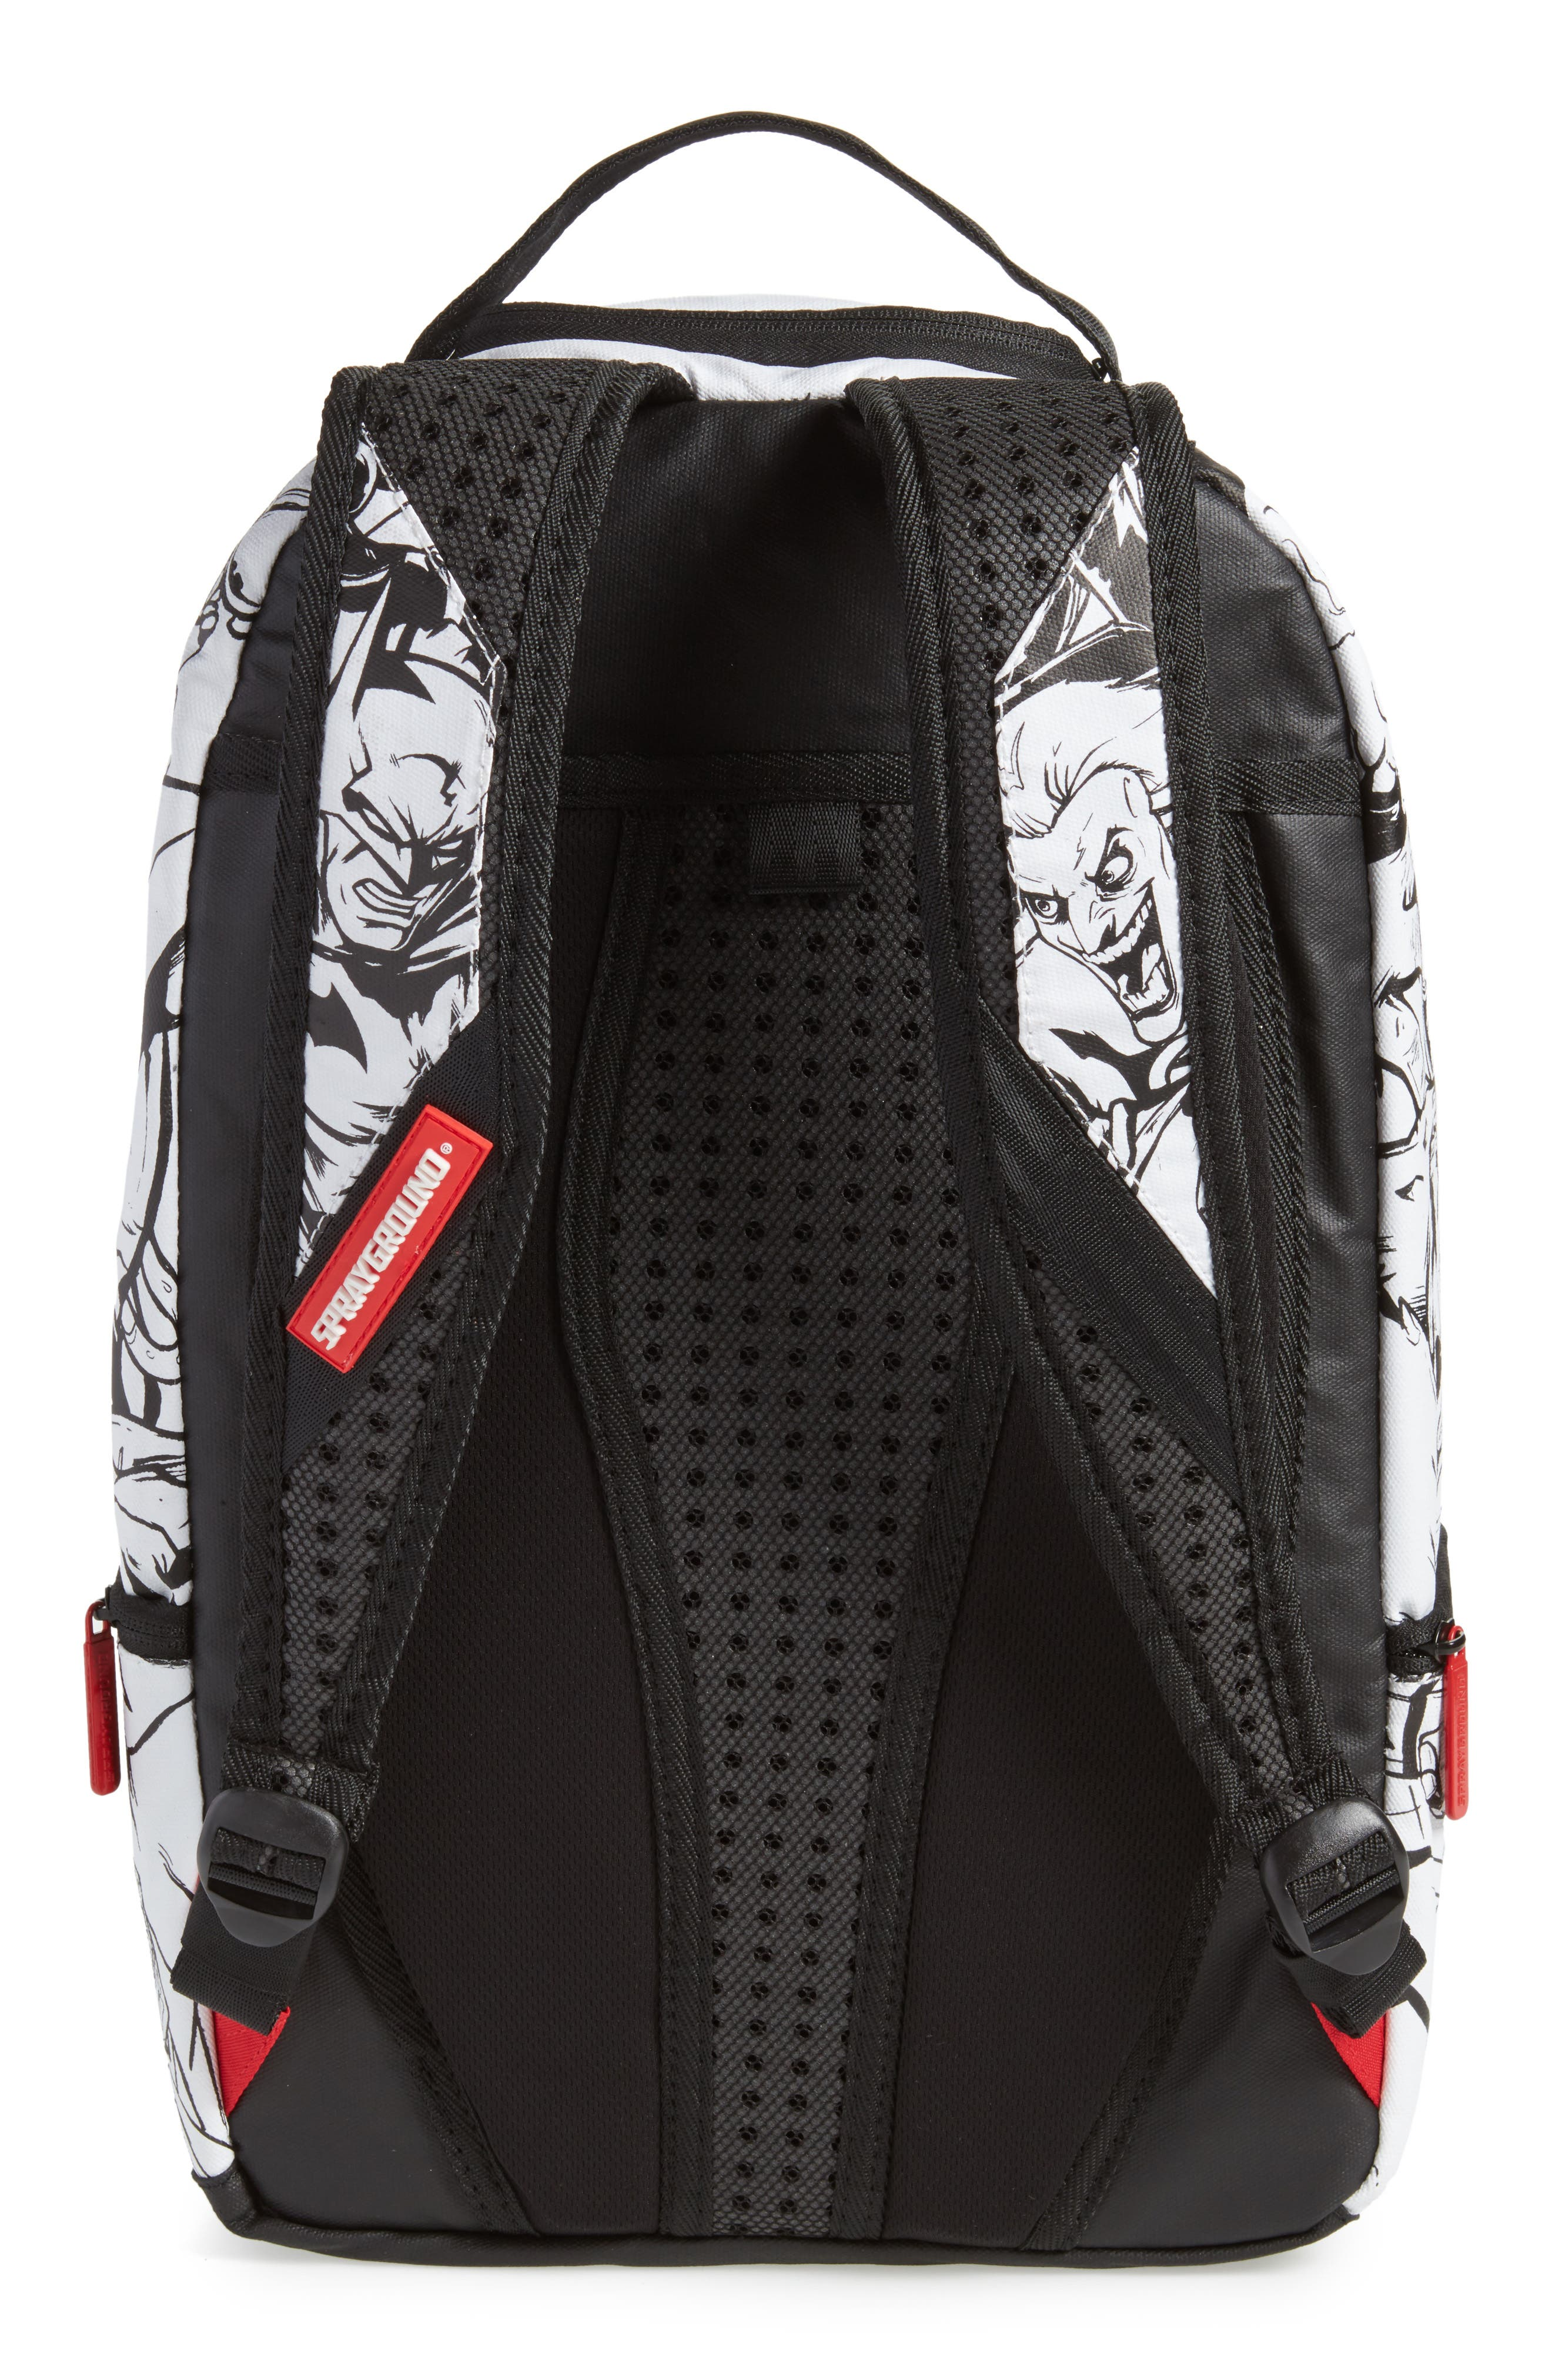 Batman DIY Villains Backpack,                             Alternate thumbnail 3, color,                             Black/ White